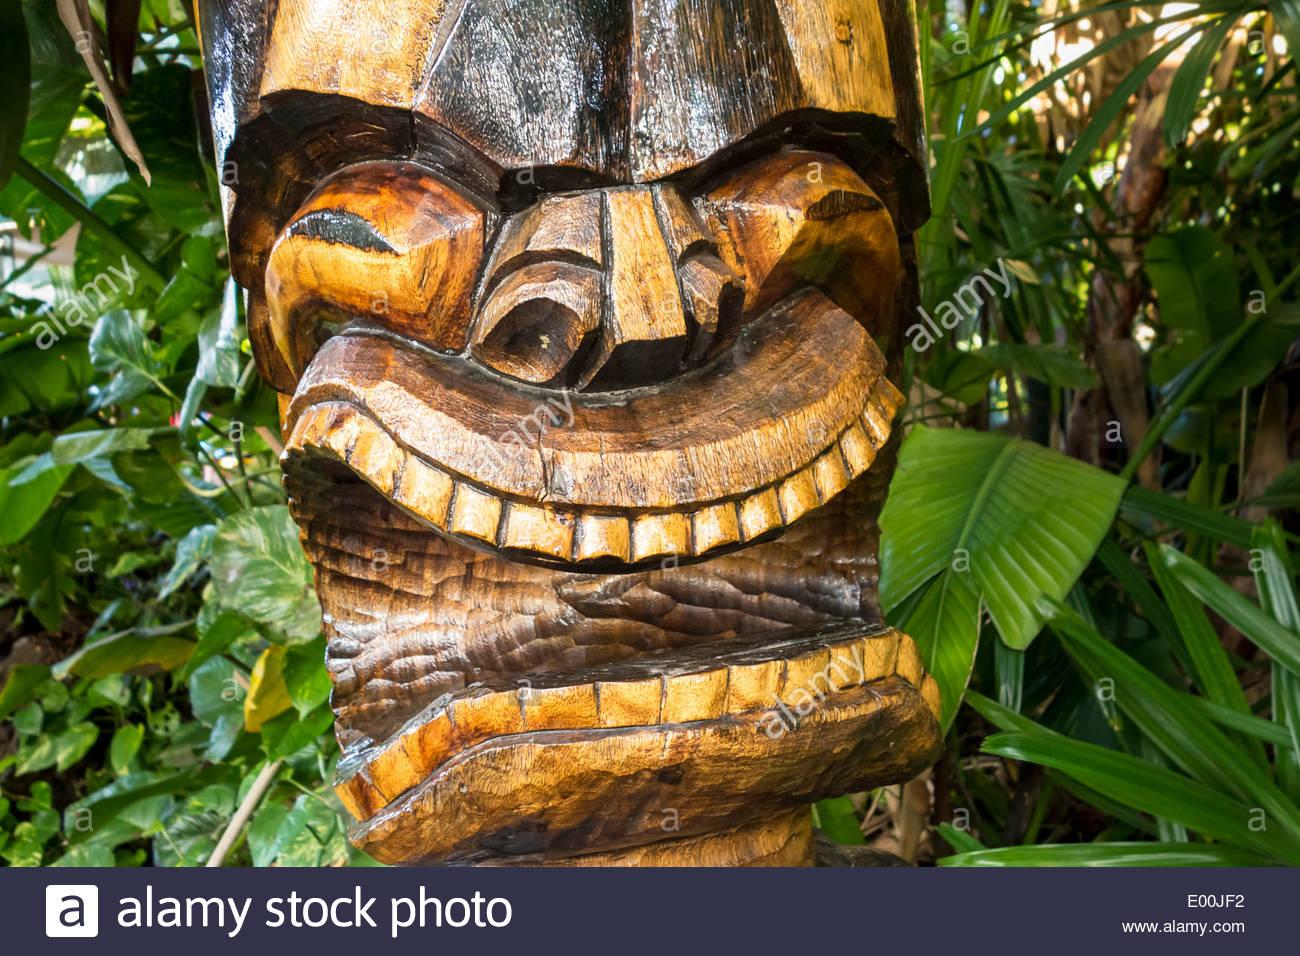 Tiki Hawaiian culture statue in shopping area of Kihei on the island of Maui in the State of Hawaii USA Stock Photo